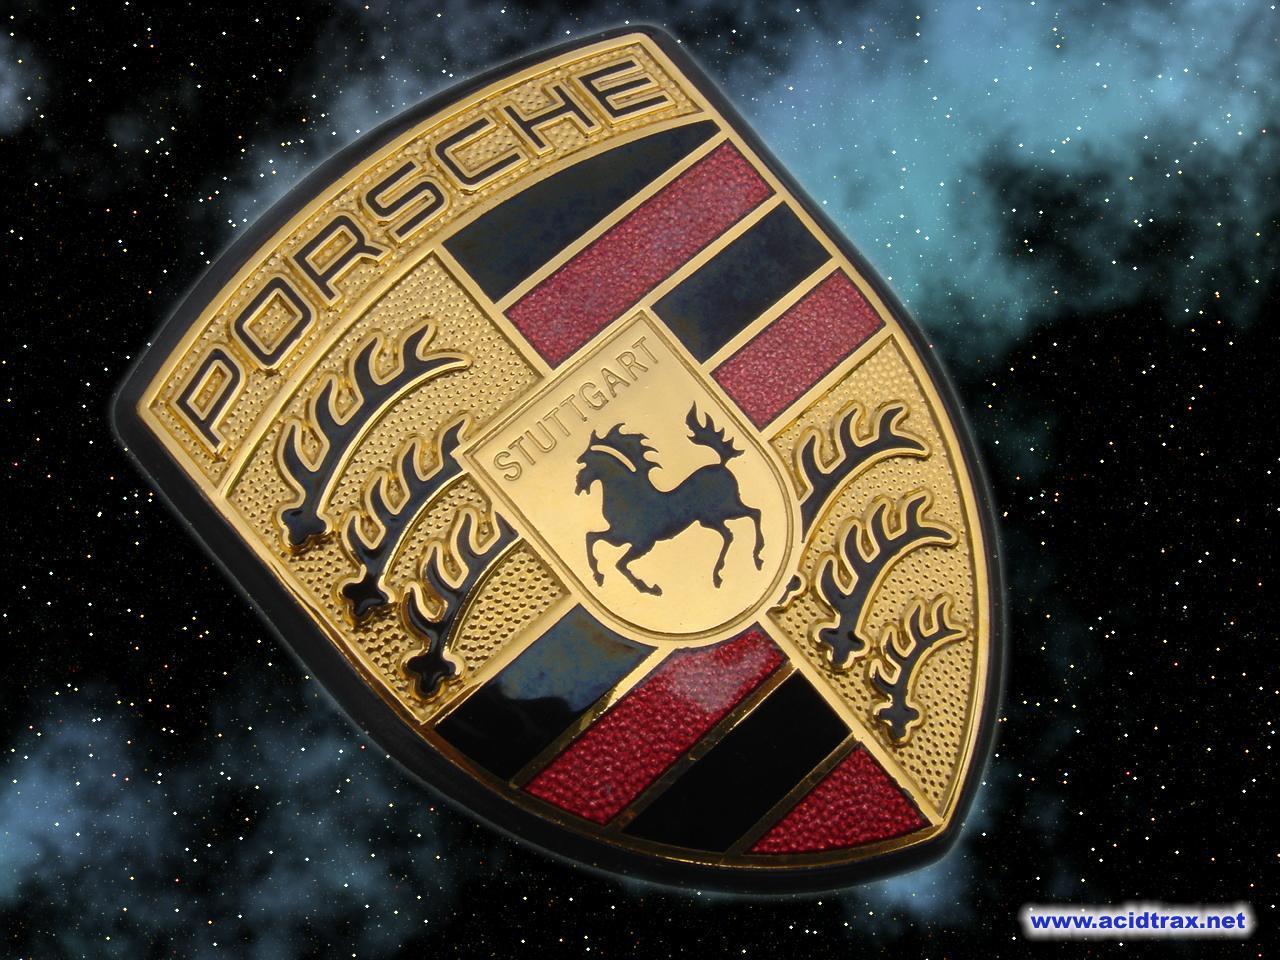 Porsche Desktop Wallpapers 1280x960